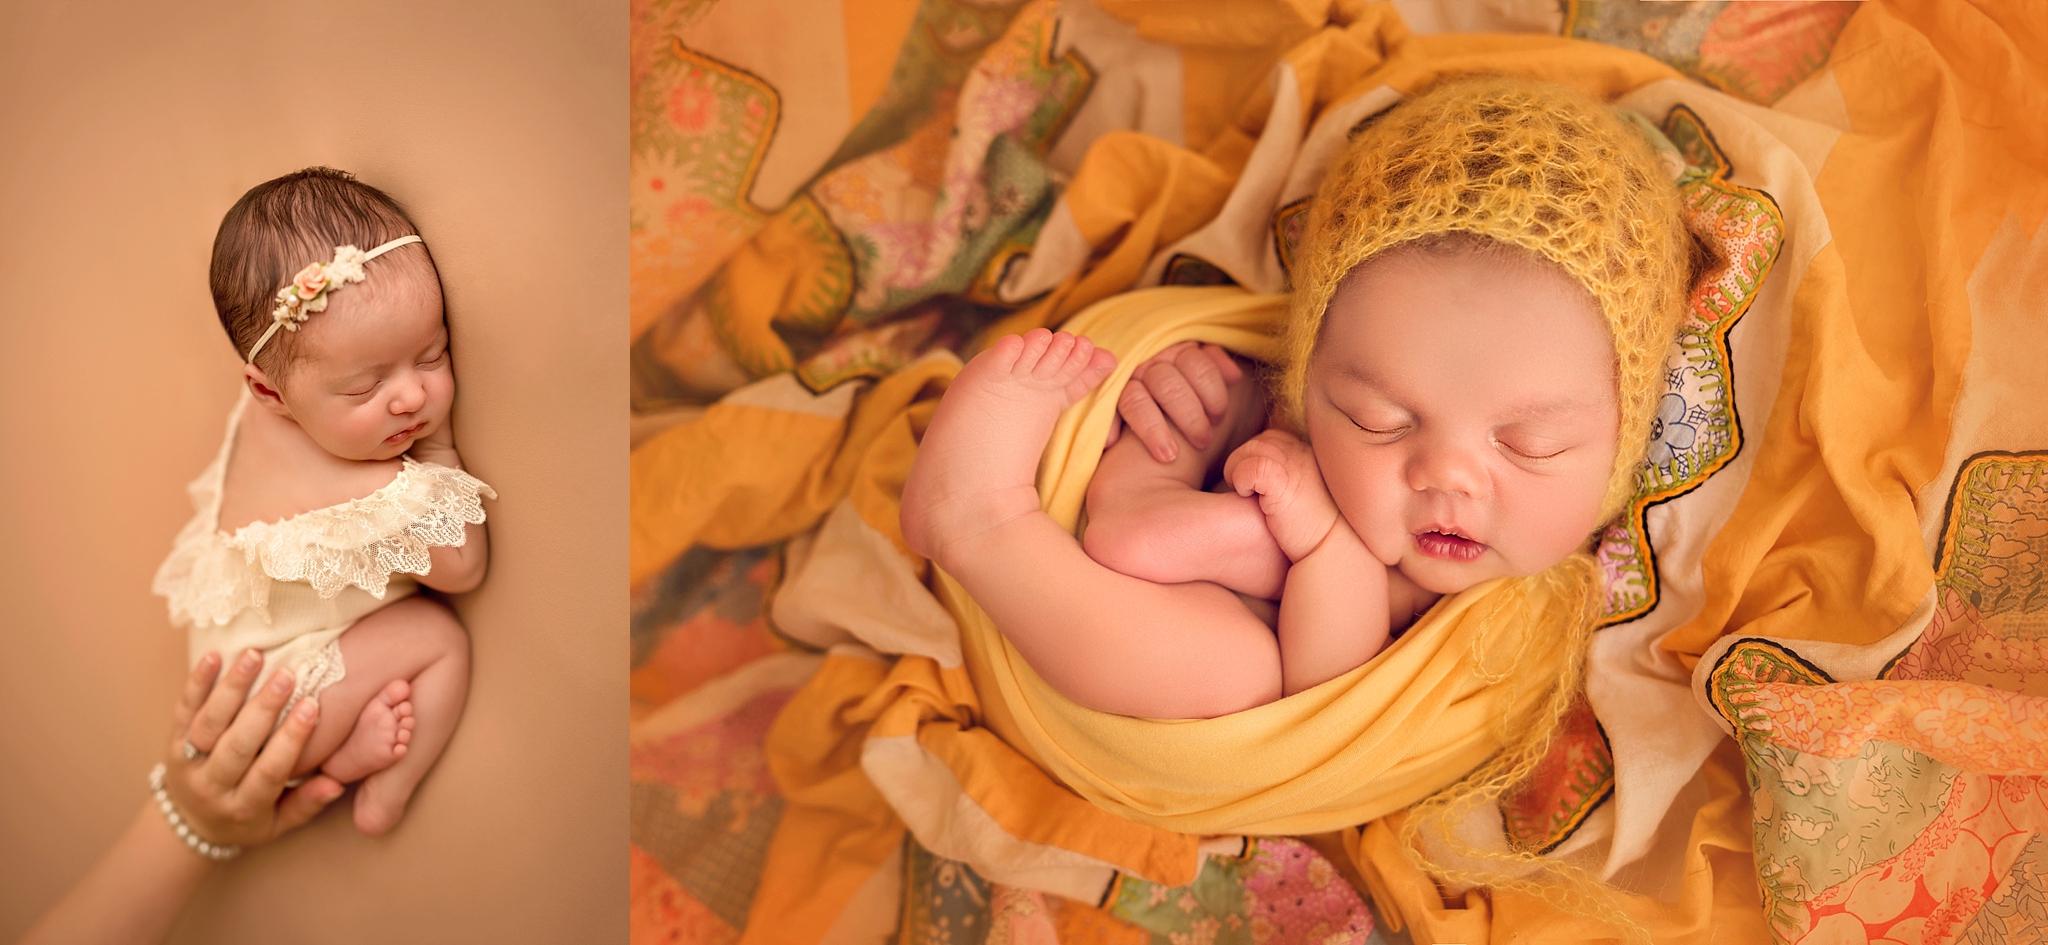 Best-Newborn-Photographer-Miami-Florida_0037.jpg